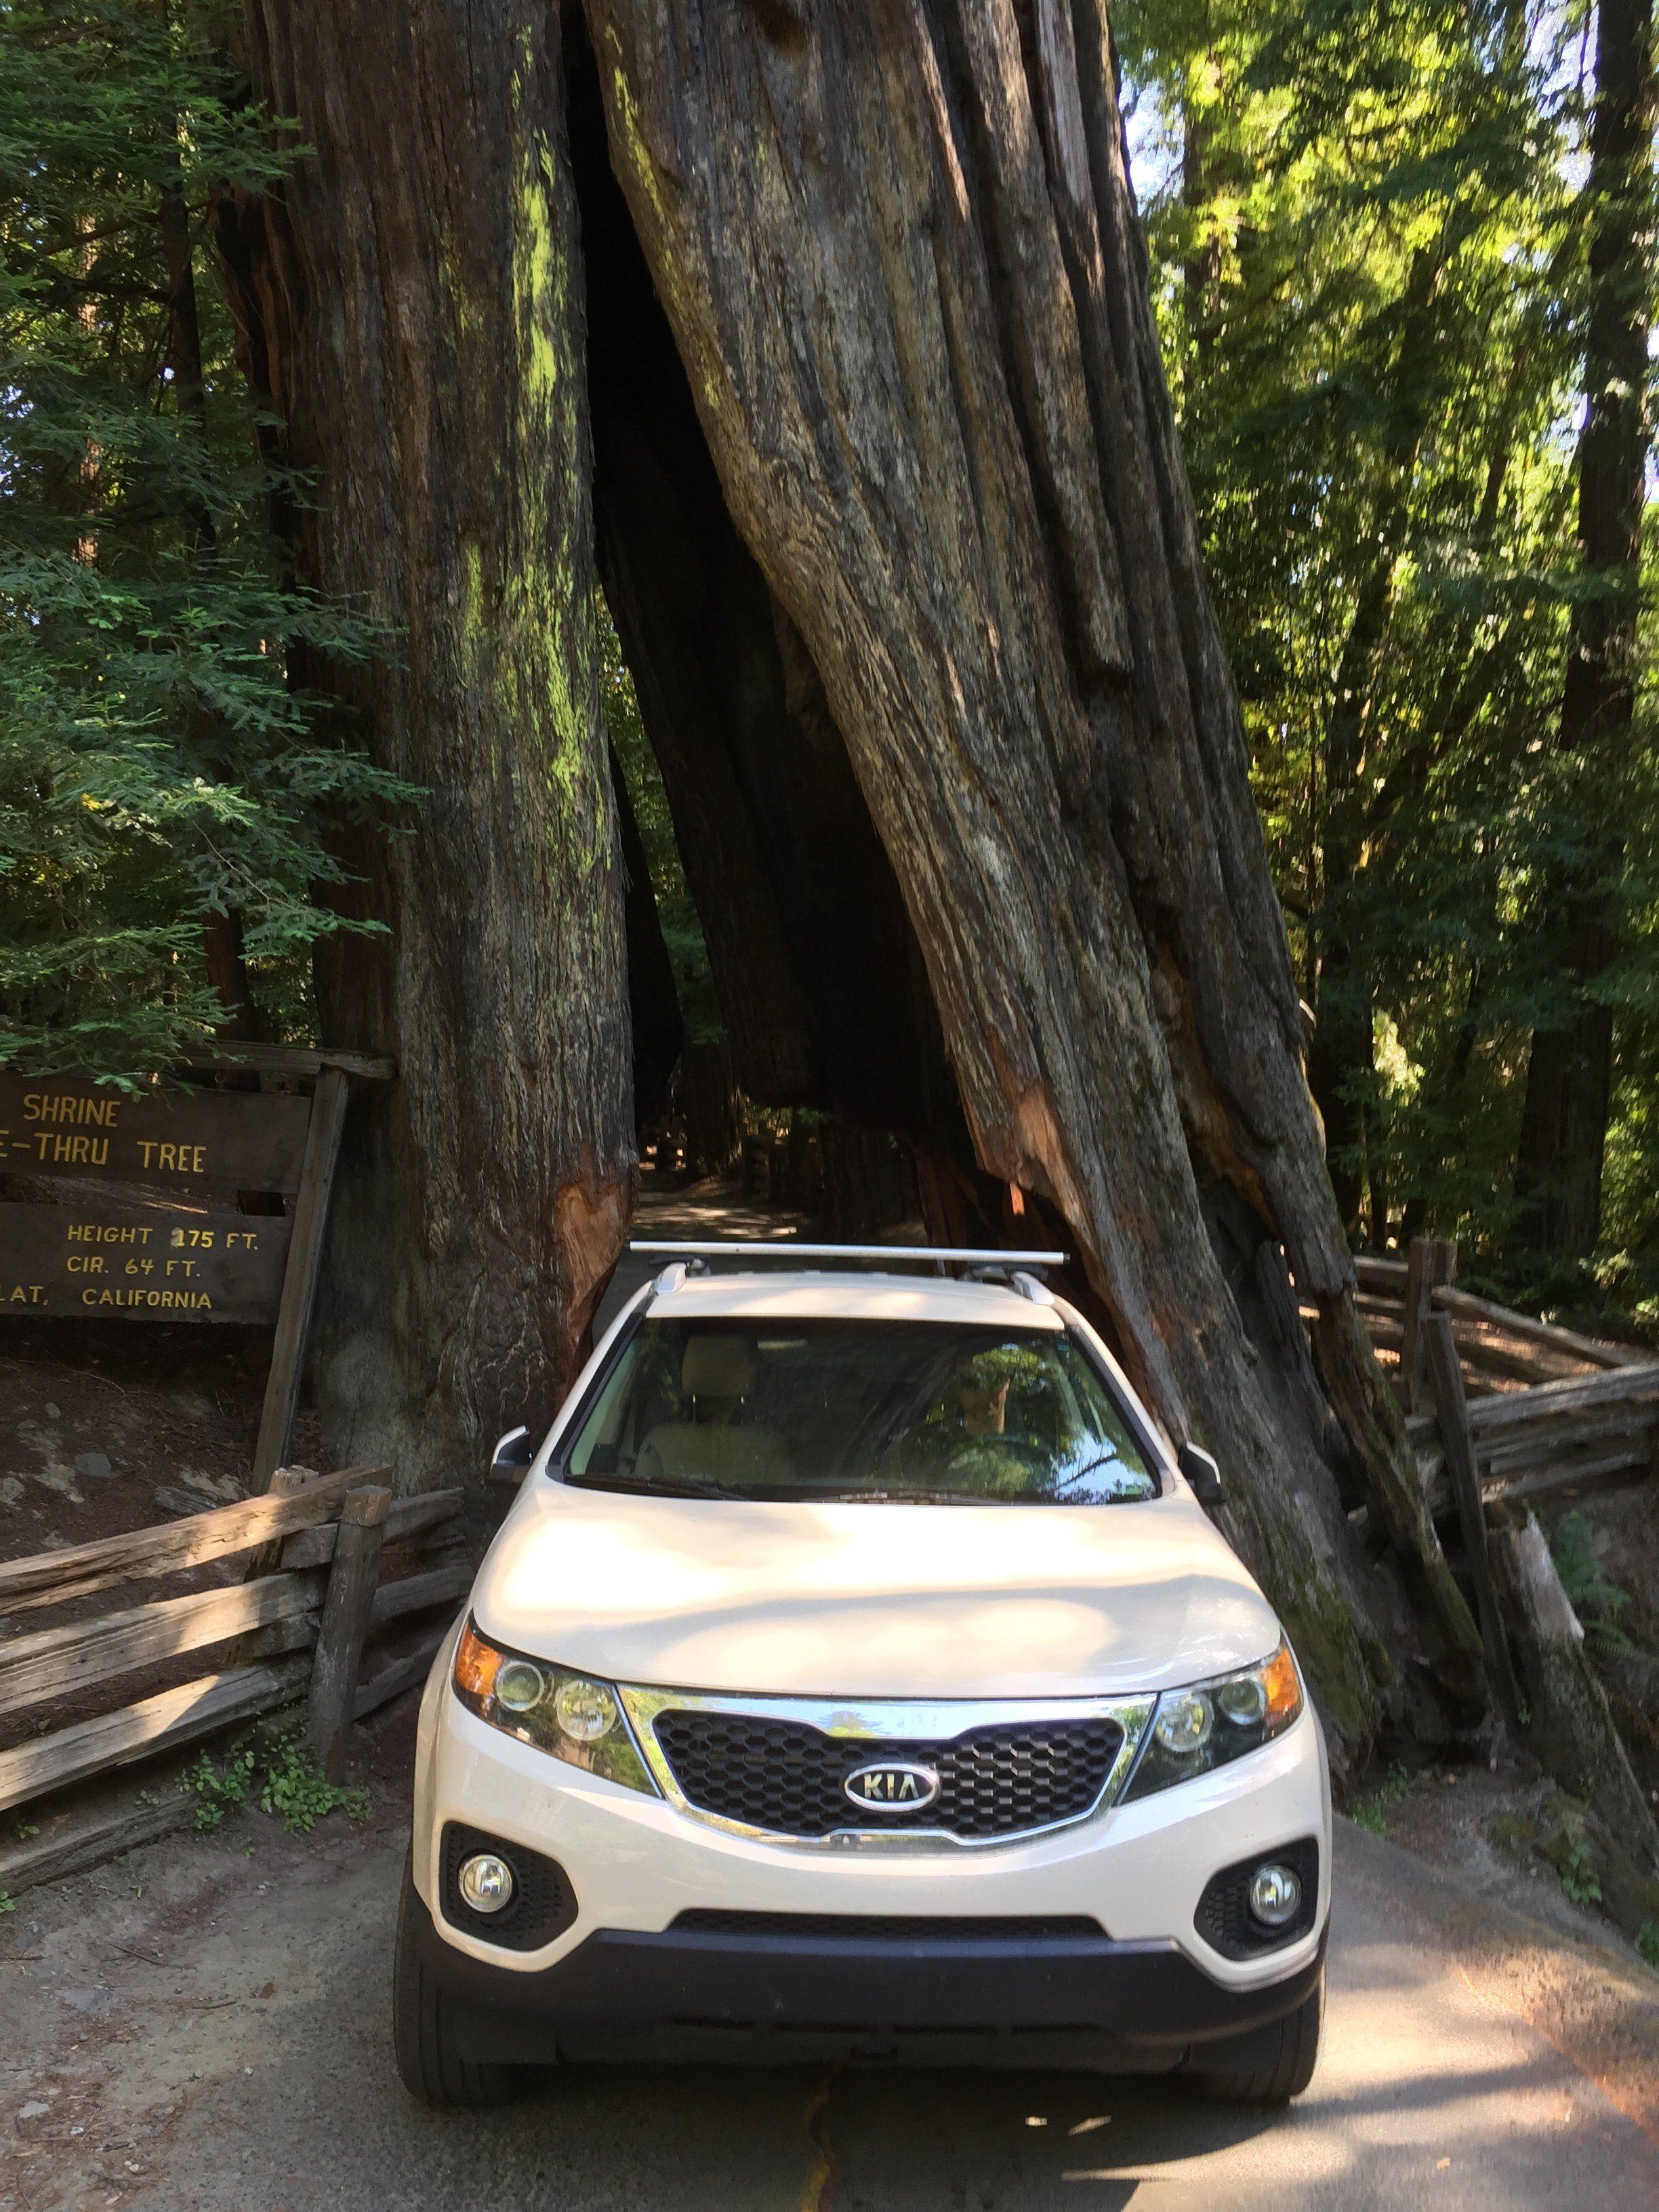 Drive-Thru Trees Along the Redwood Coast in Humboldt ...